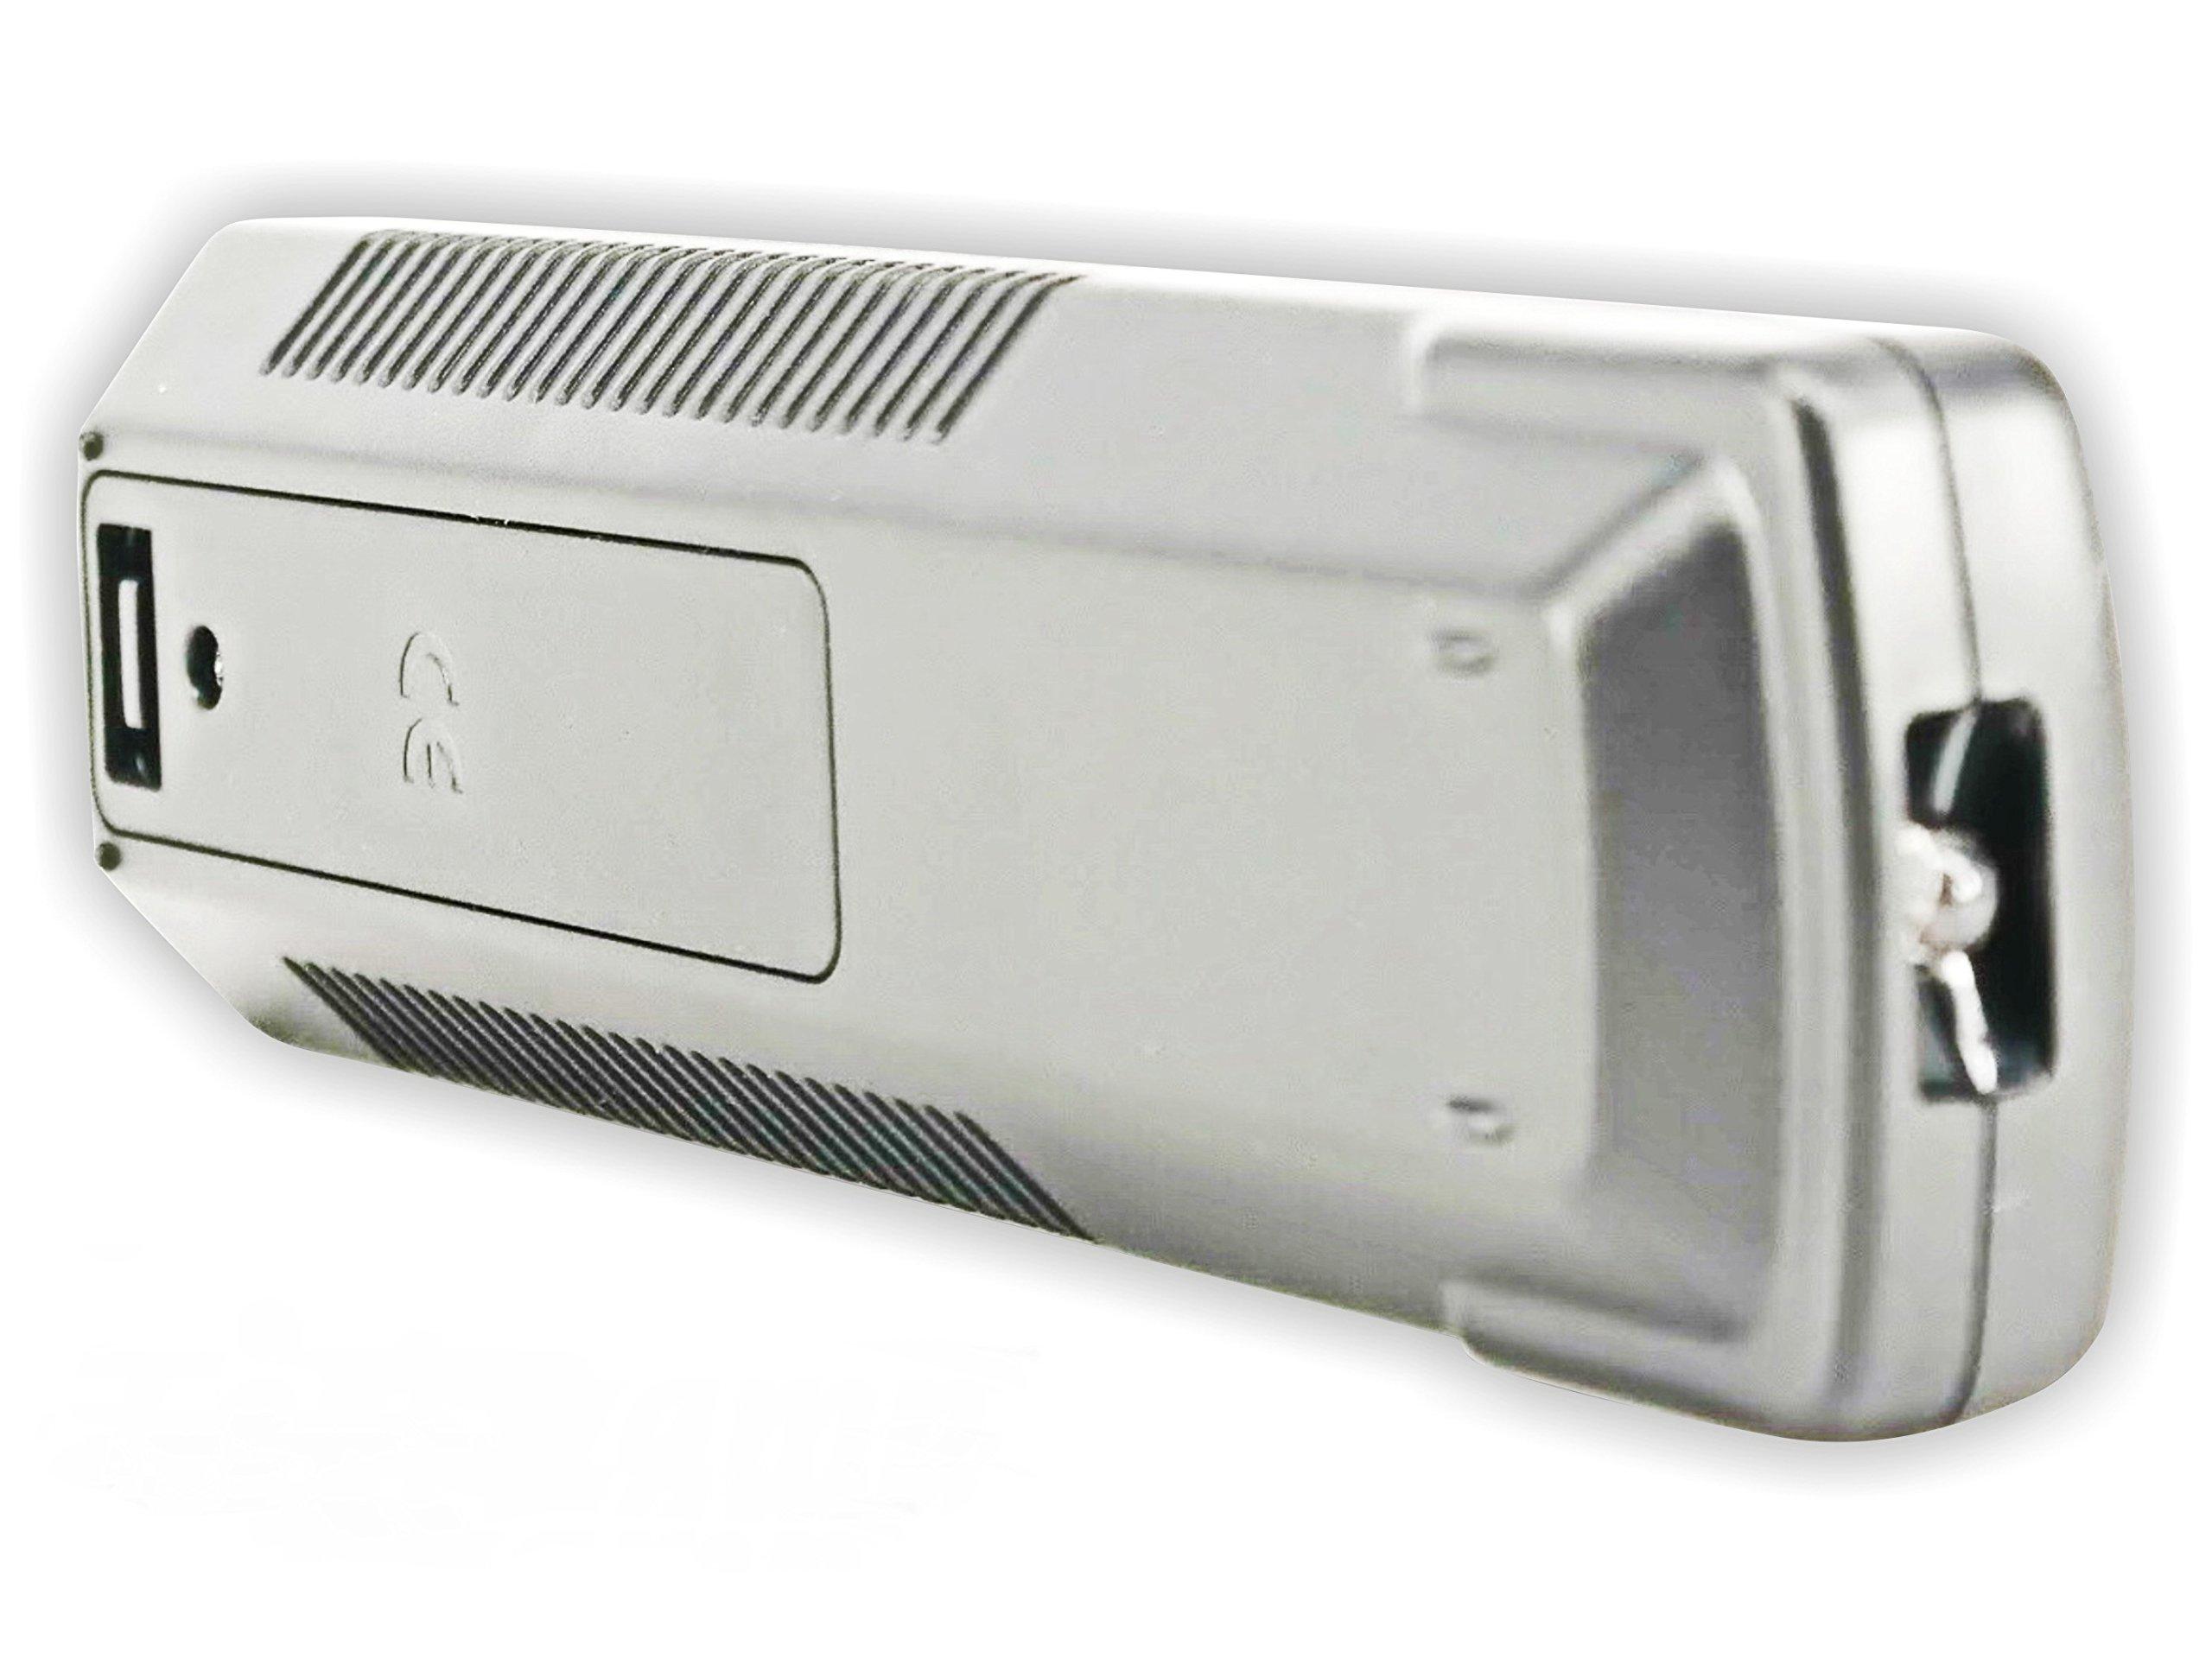 Toshiba SD-6100KU2 TeKswamp Remote Control by Tekswamp (Image #6)